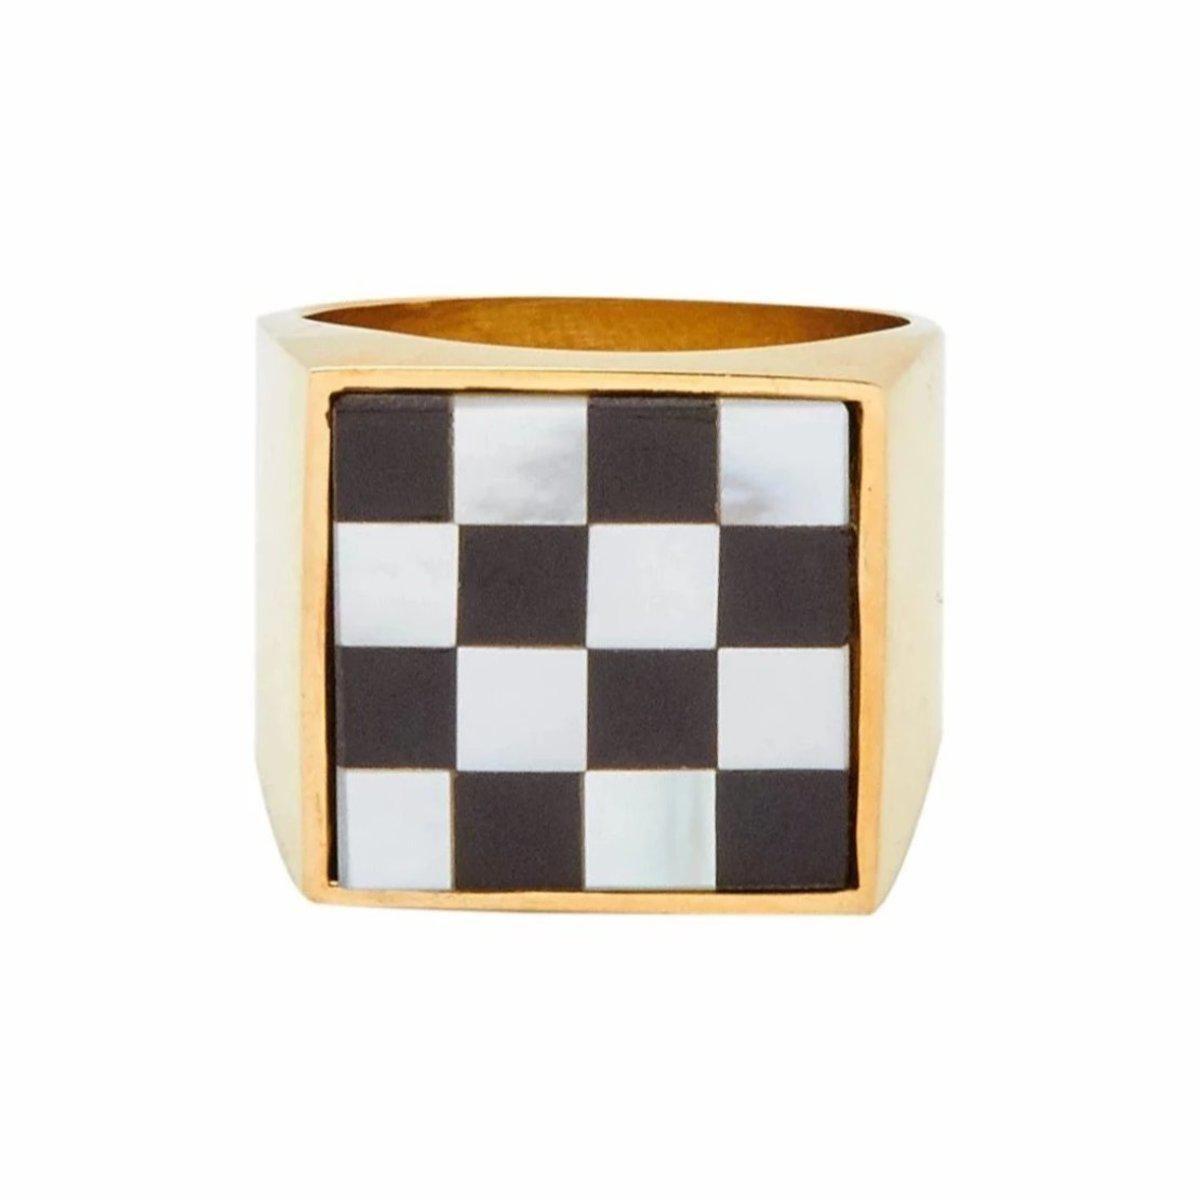 tarin thomas unisex checkered samuel ring